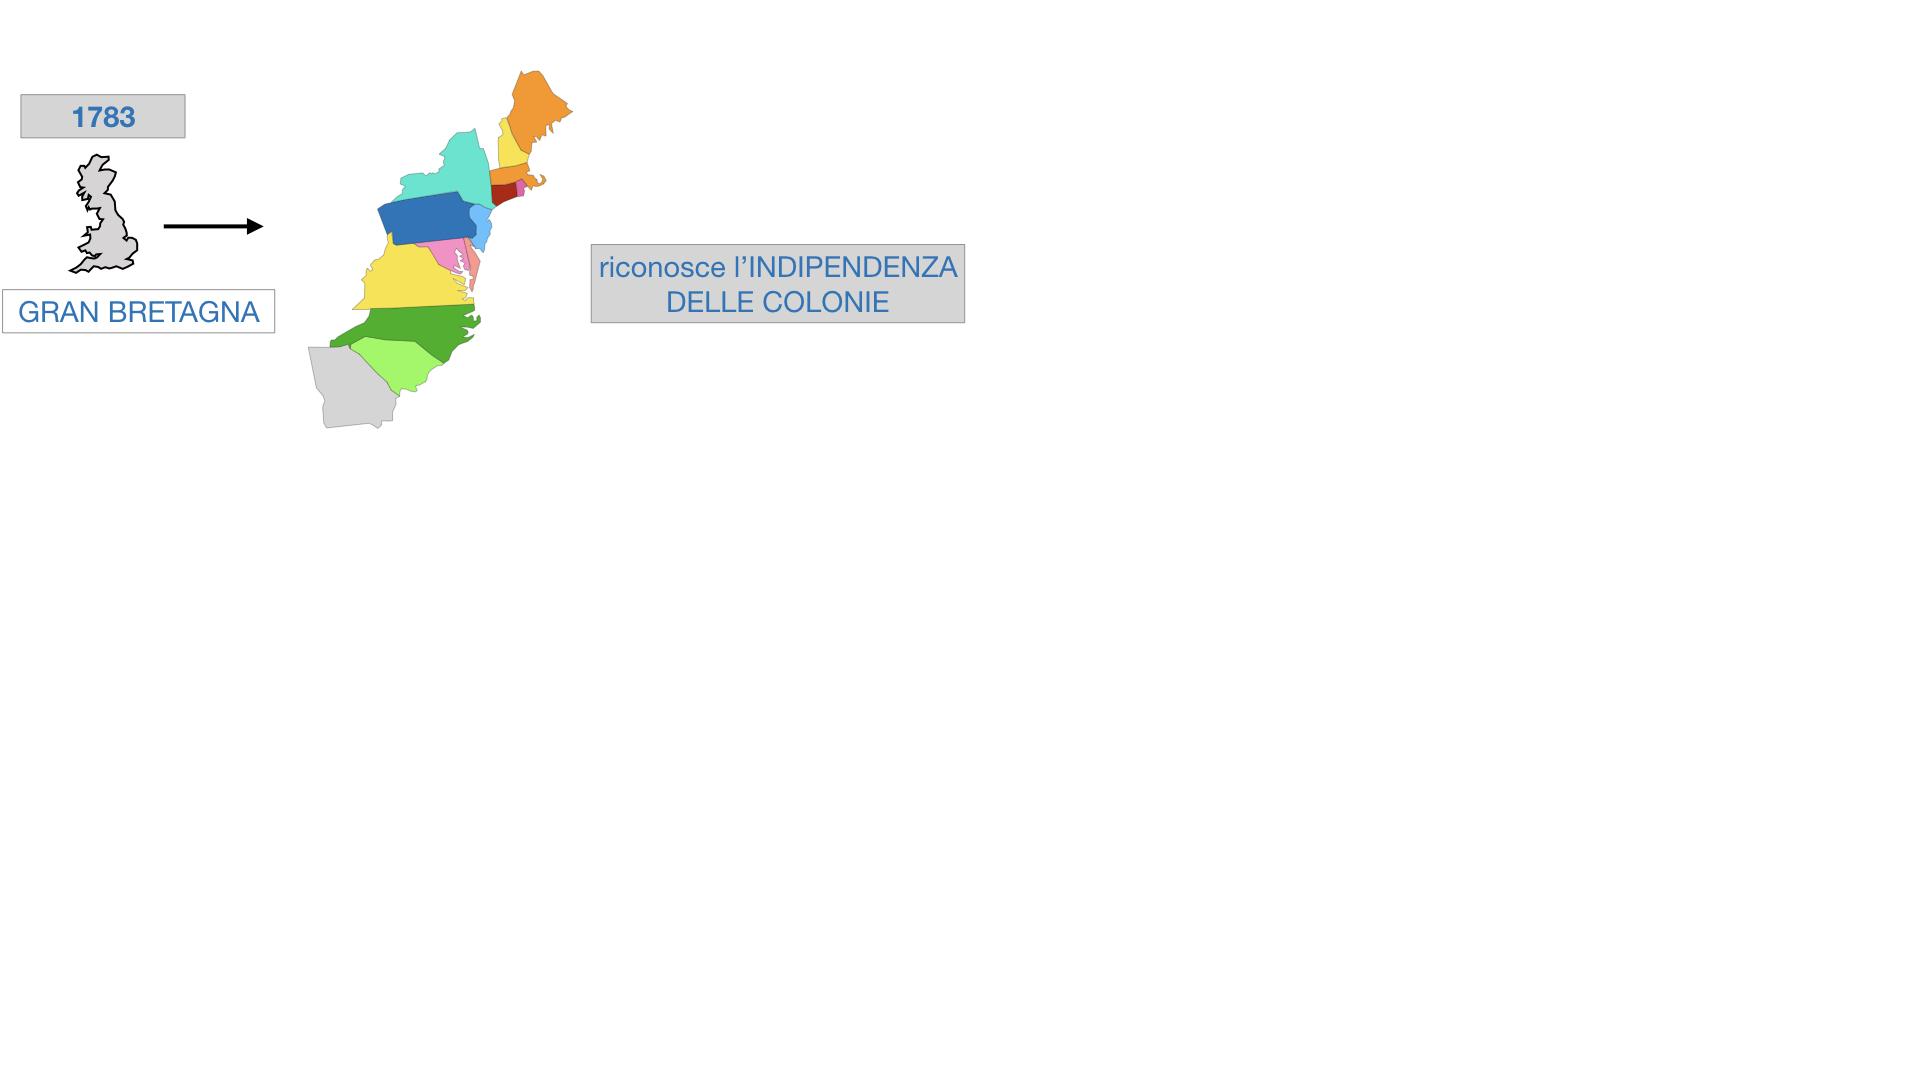 GUERRA DI INDIPENDENZA AMERICANA_SIMULAZIONE.135